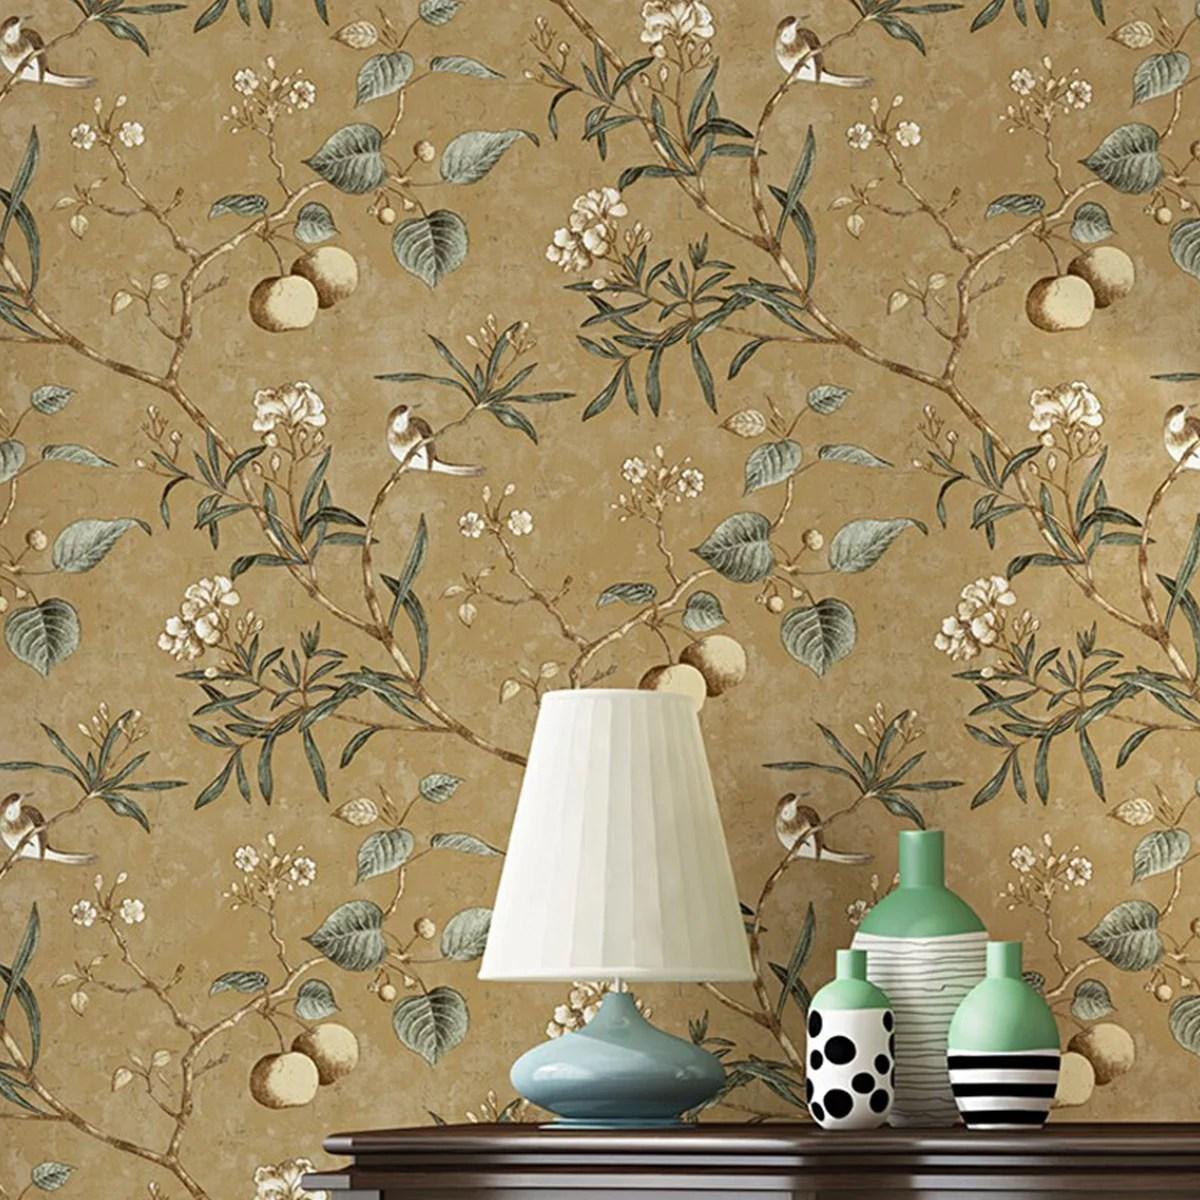 Hallolure 20 86 X 393 Inches Flower Home Waterproof Flower Wallpaper Vintage Flower Trees Birds Wallpaper For Livingroom Bedroom Kitchen 57 Square Ft Walmart Com Walmart Com